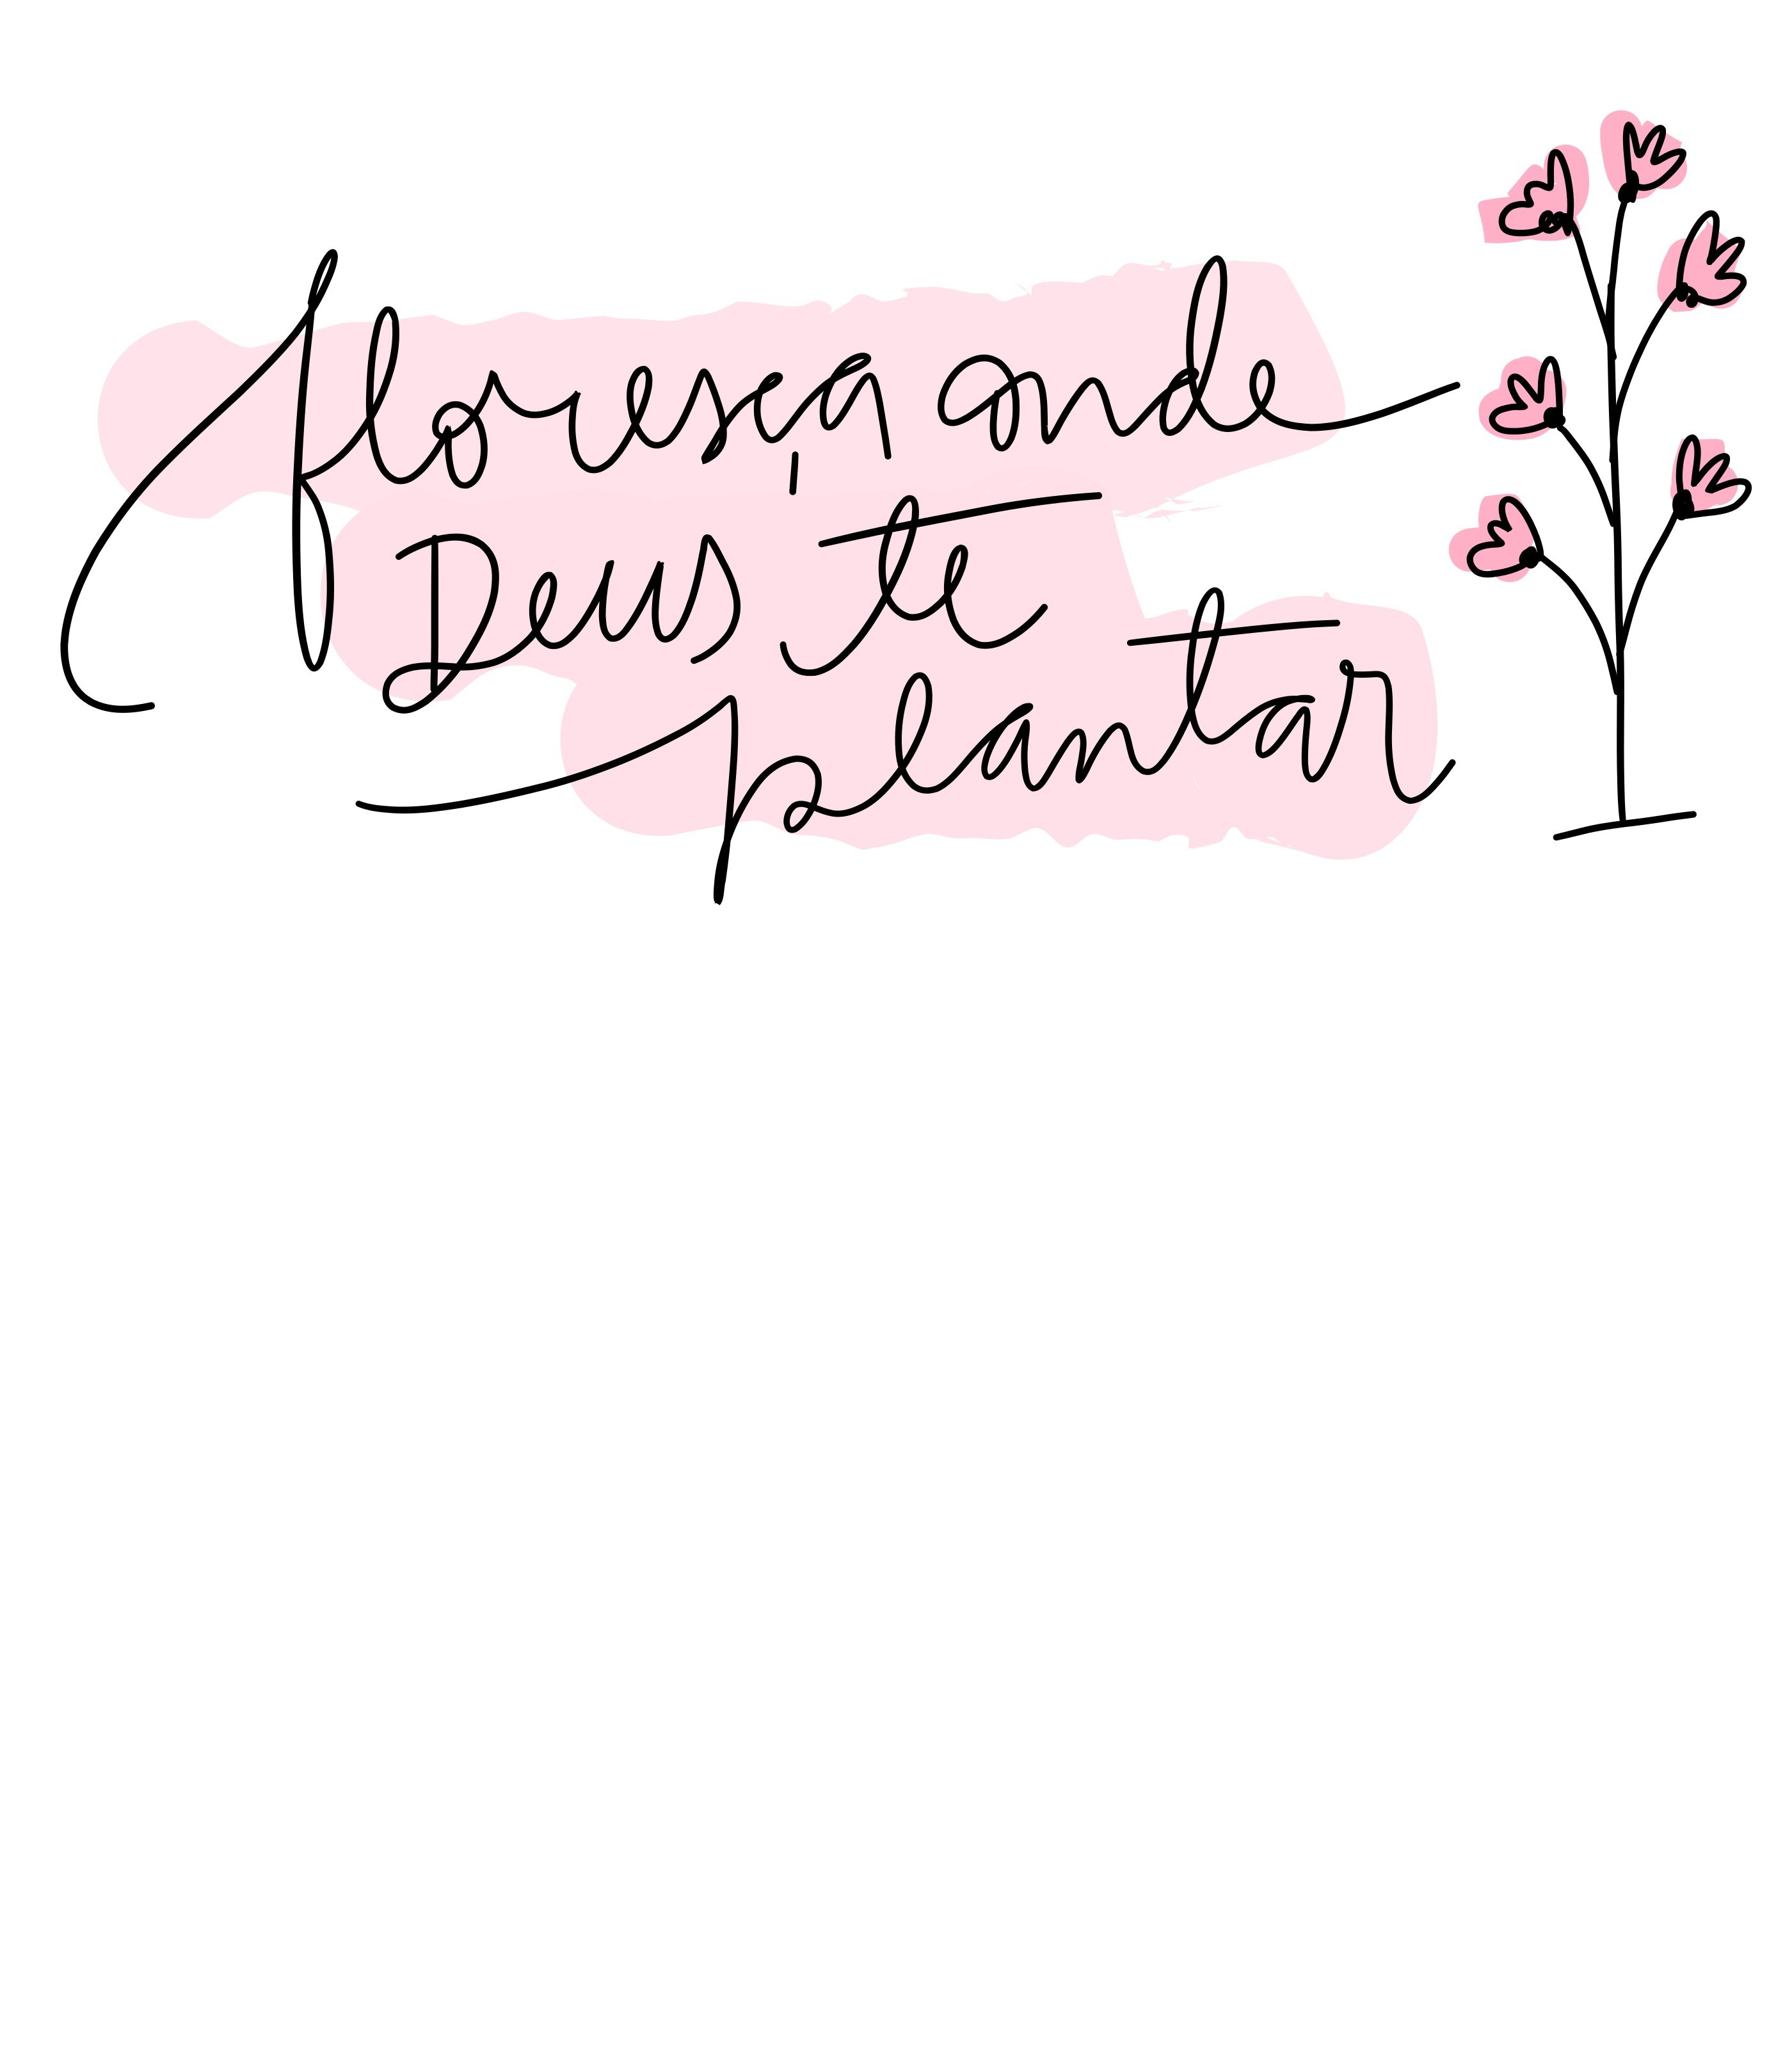 Floresça onde Deus te plantar.